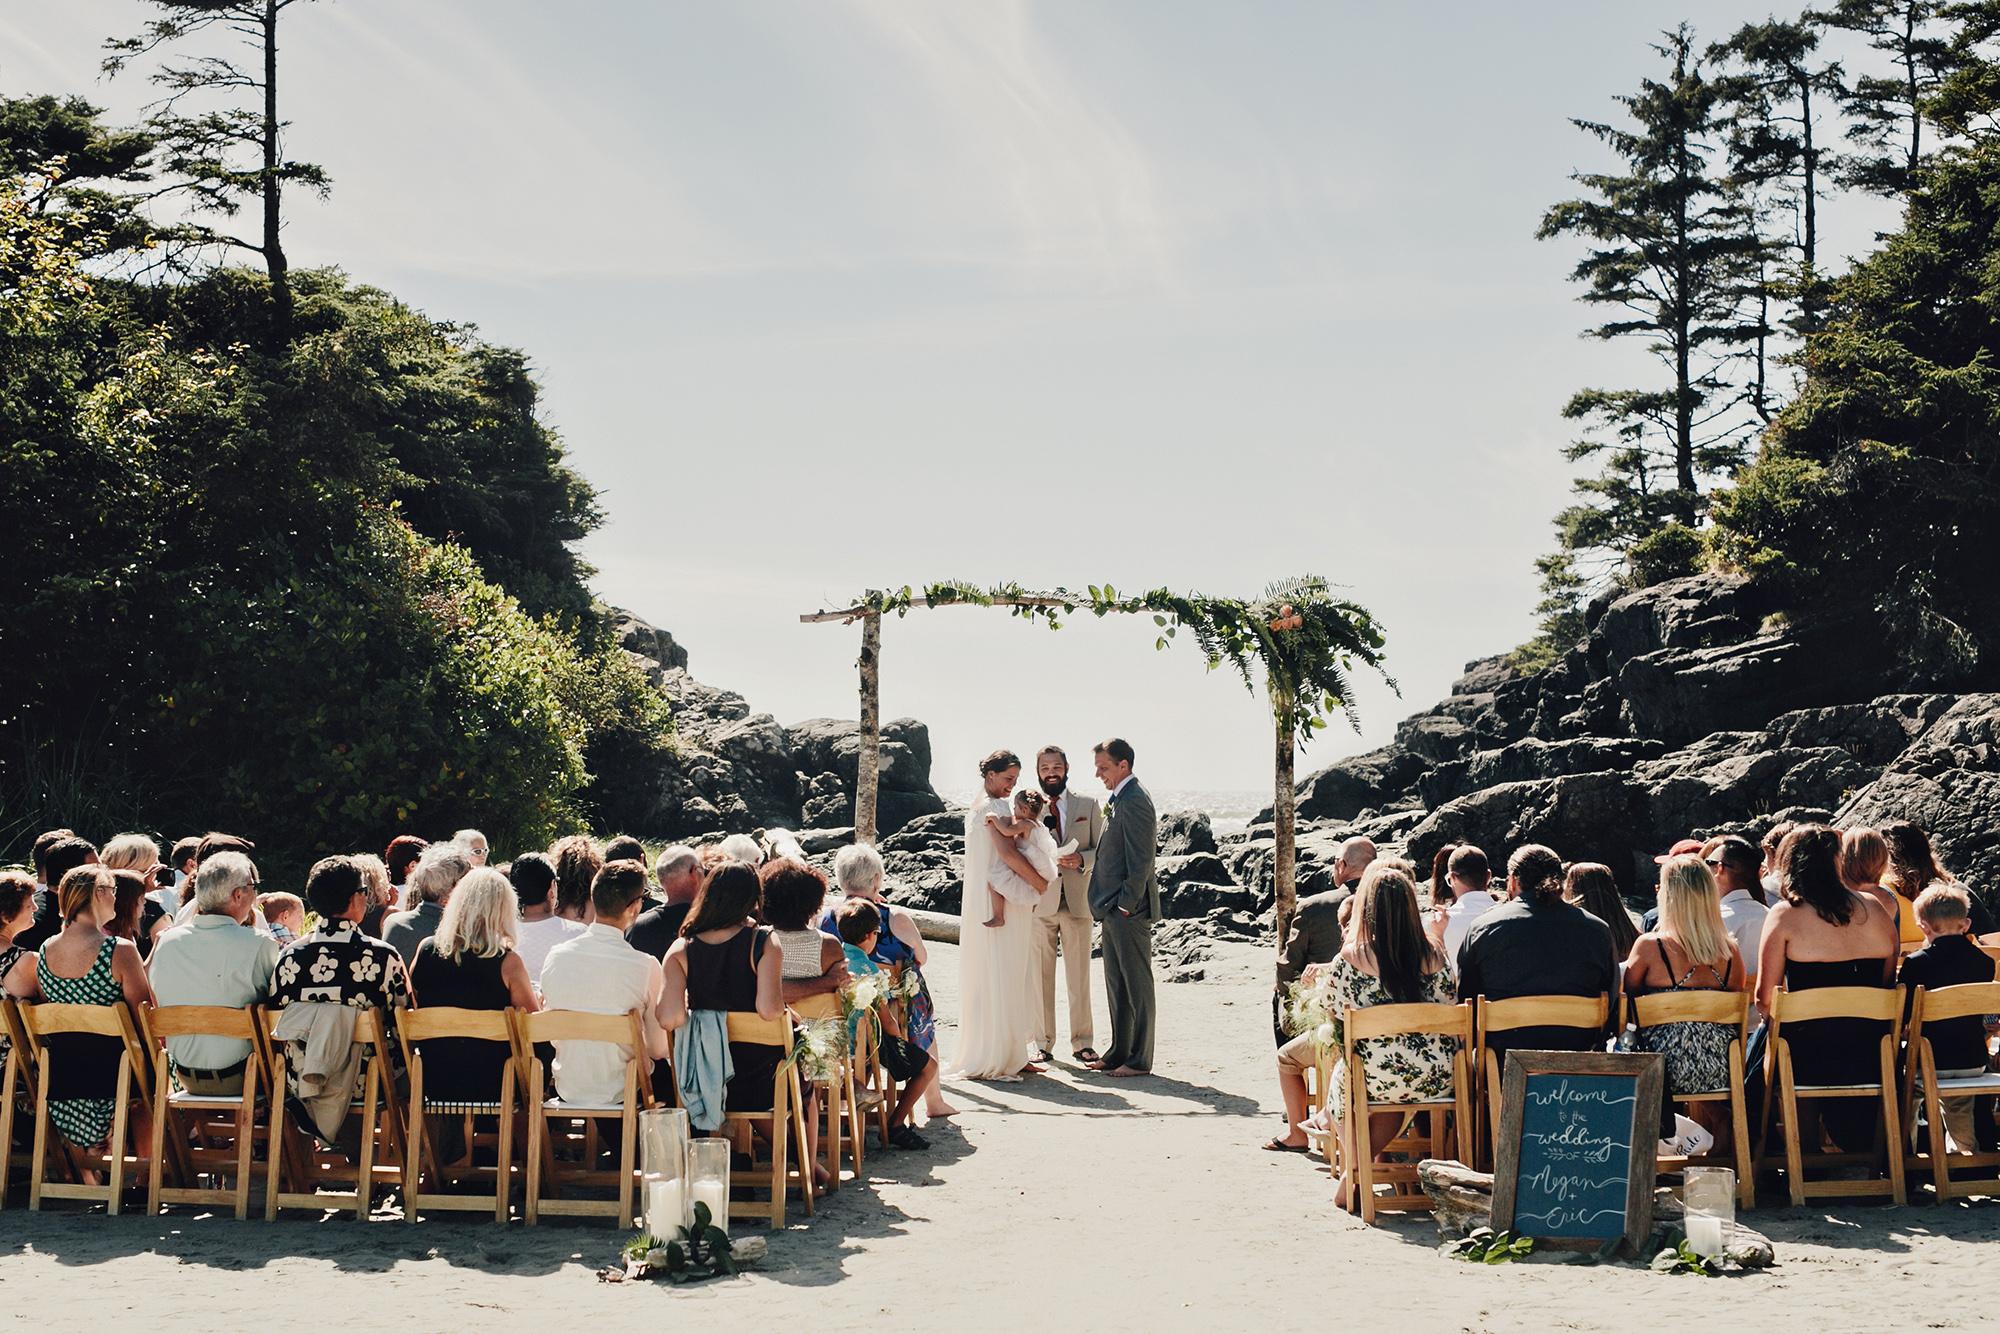 Tofino-Botanical-Gardens-Wedding-Photos-0048.jpg